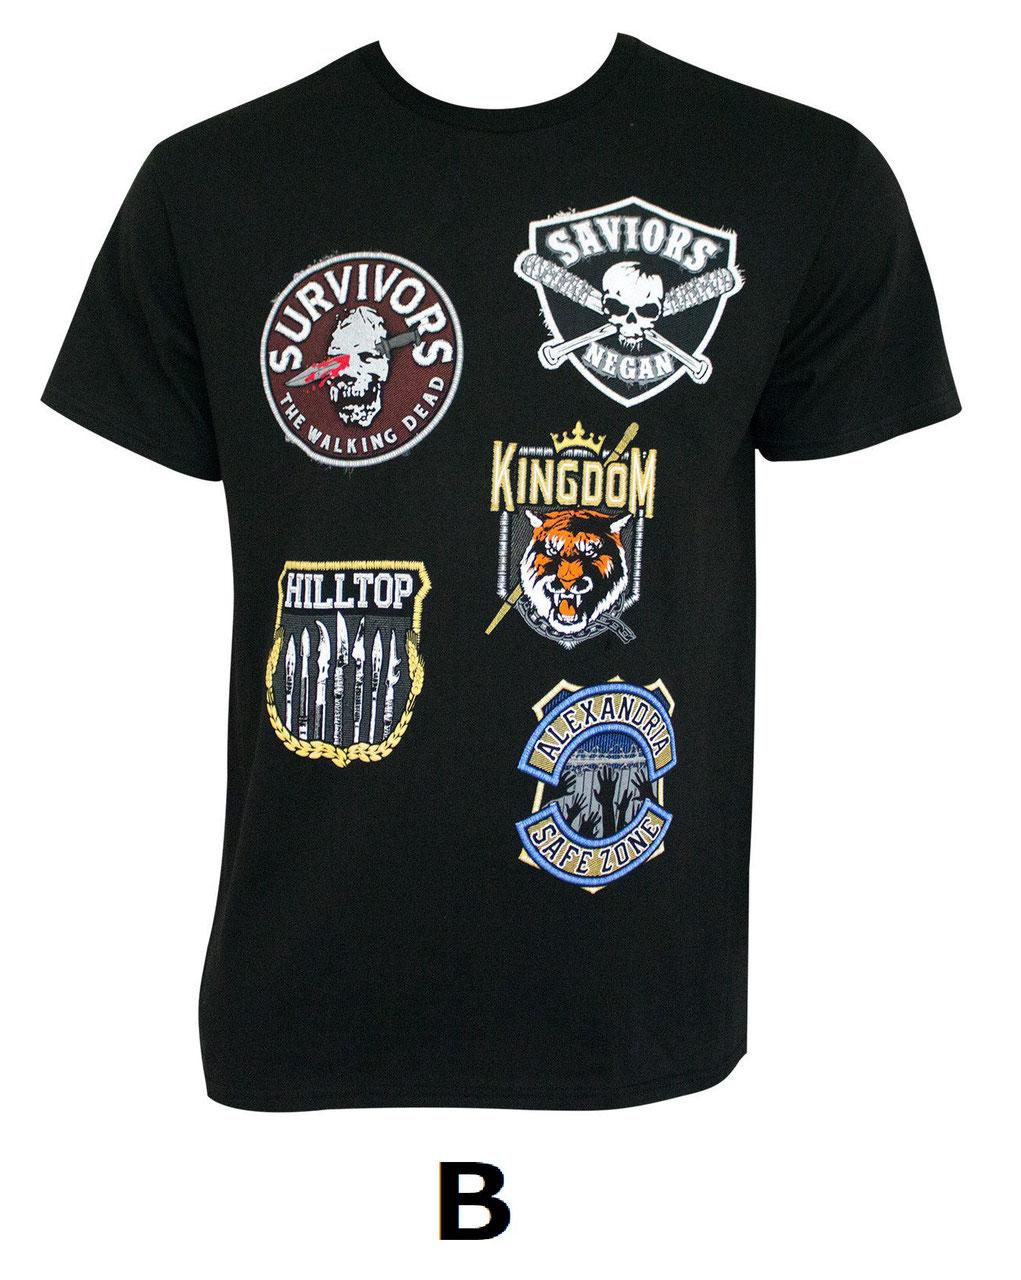 d3b581d3fb The Walking Dead(ウォーキング・デッド) Tシャツ